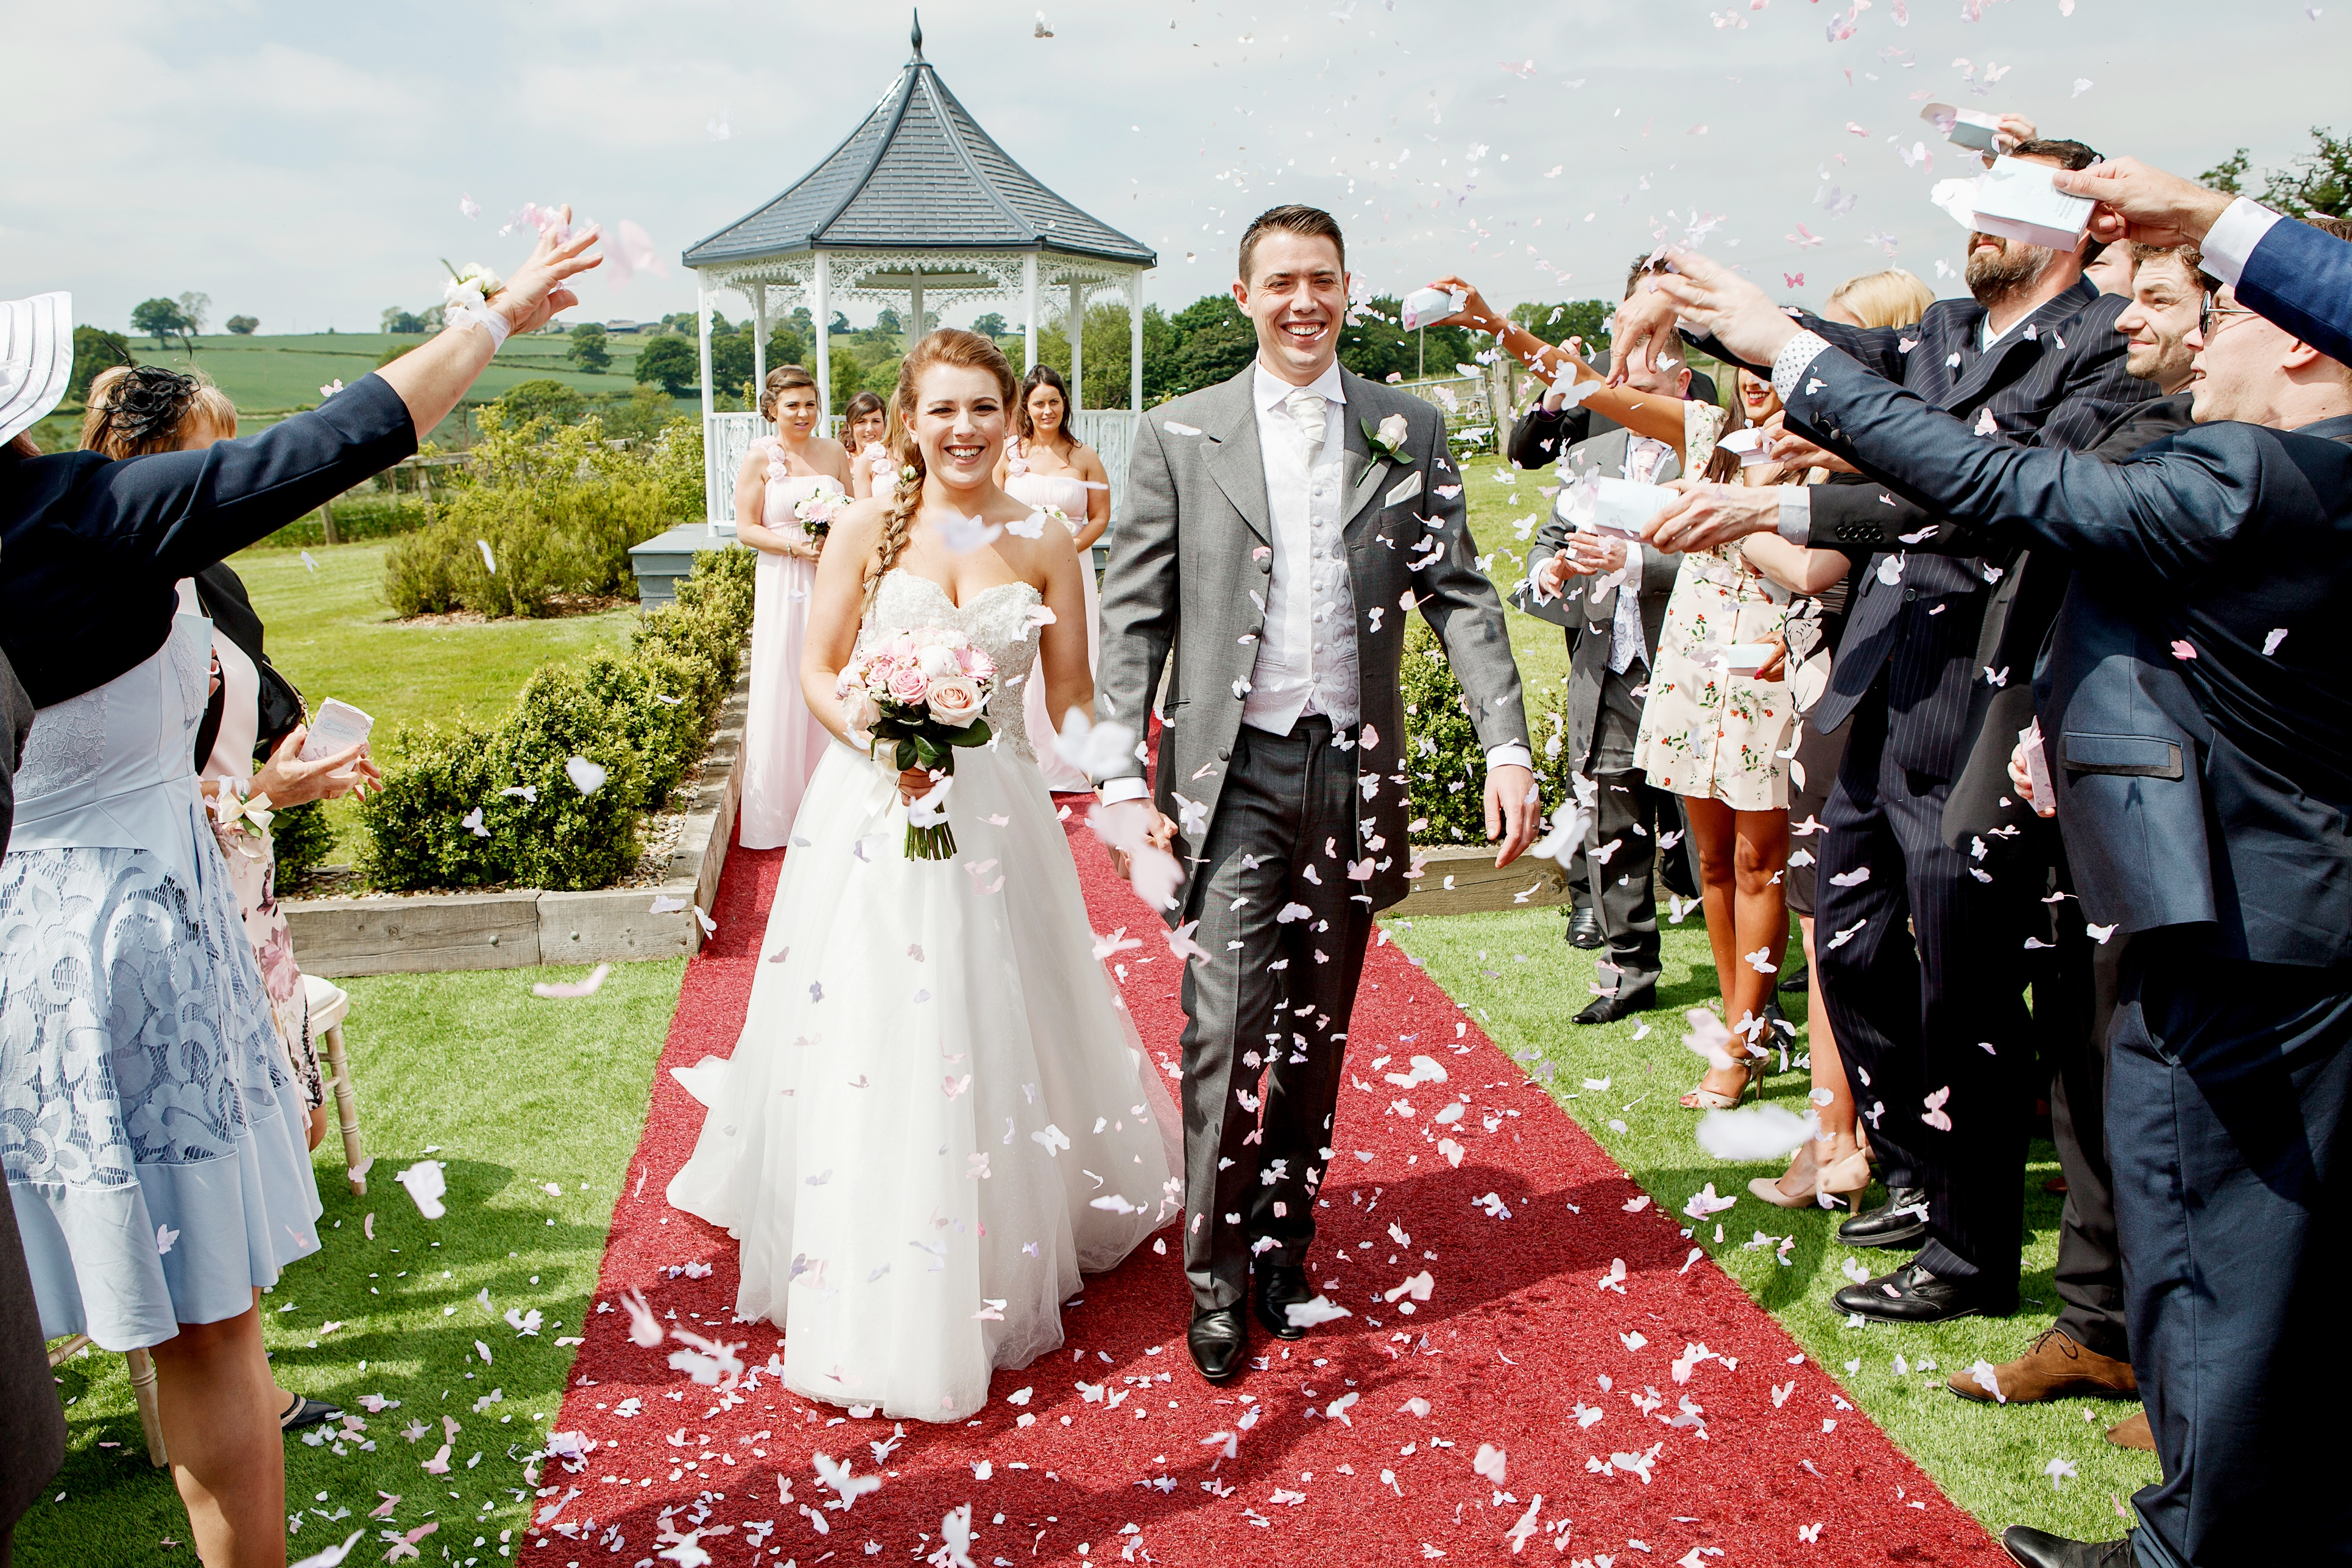 Shattle-Hall-wedding-photographer-RD-Elen-Studio-Photography-299